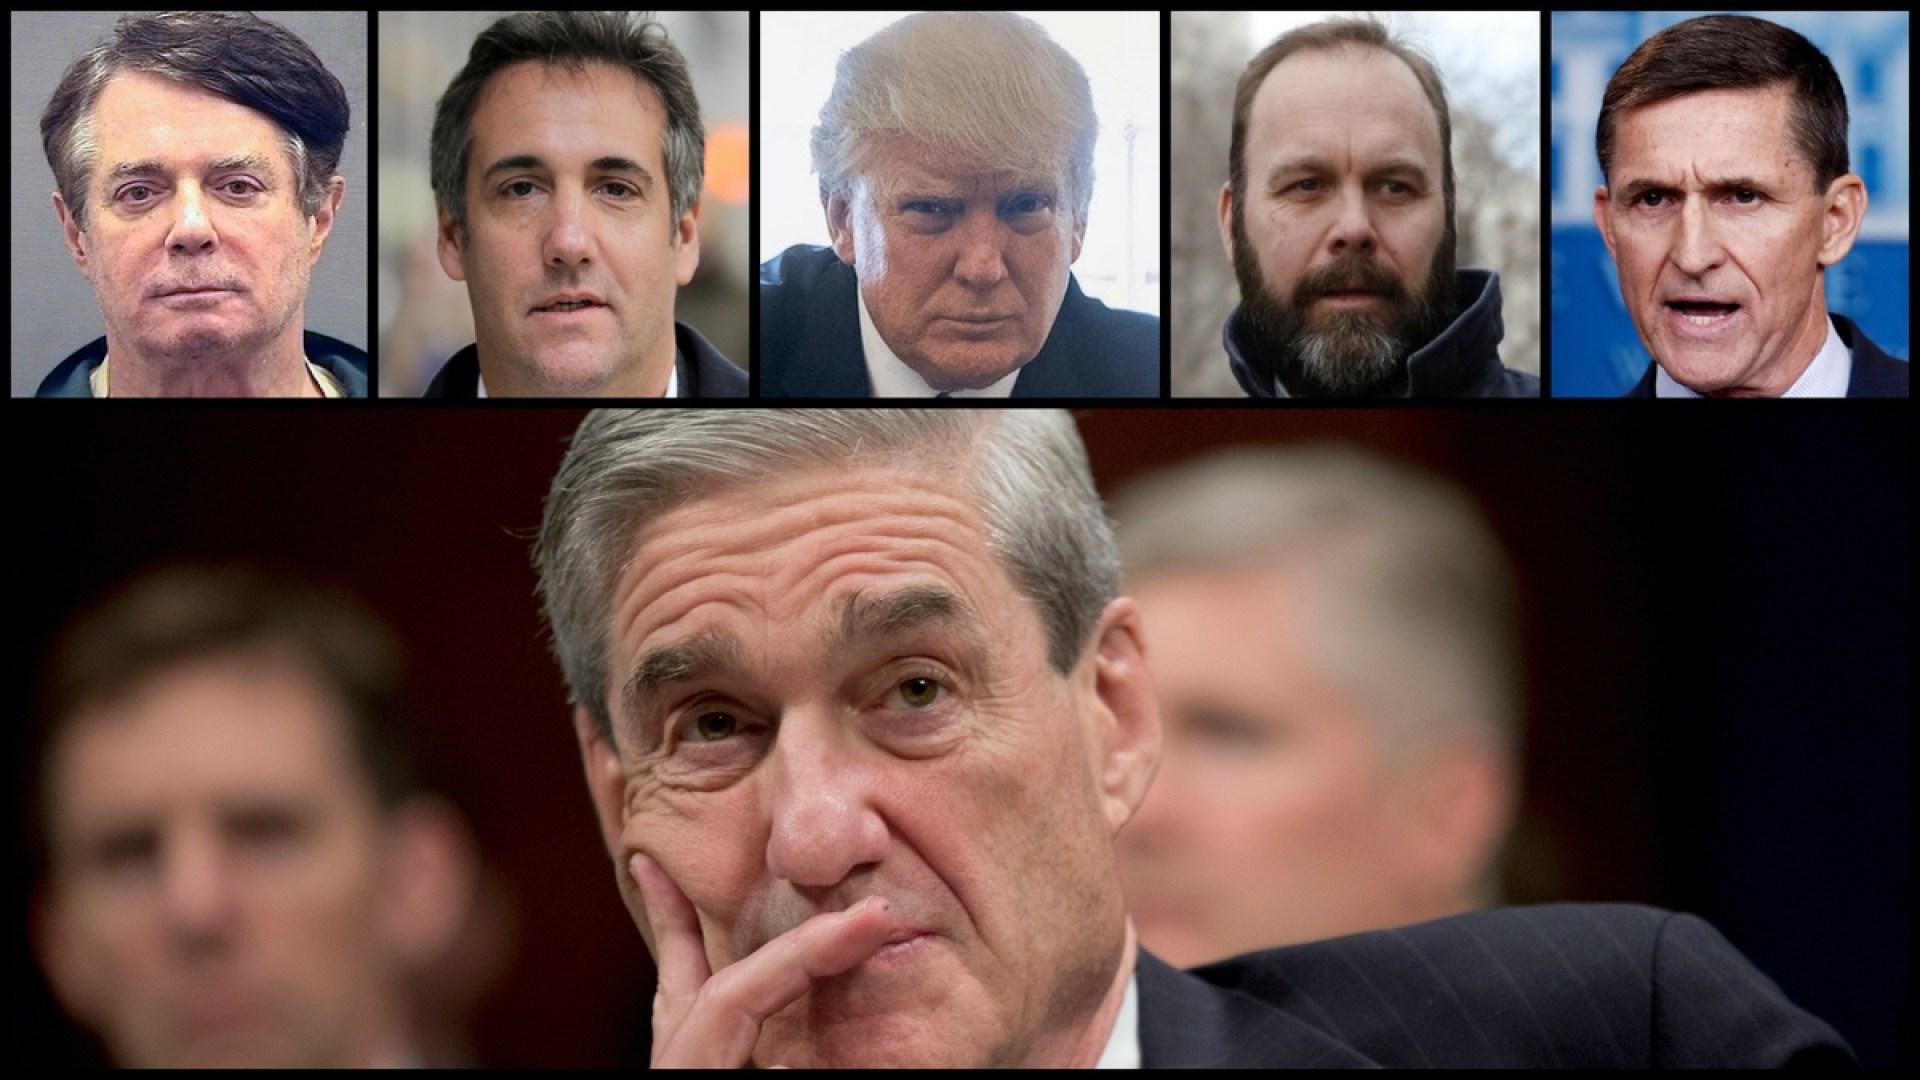 Paul Manafort, Michael Cohen, Donald Trump, Rick Gates, Michael Flynn, and Donald Trump (AP)